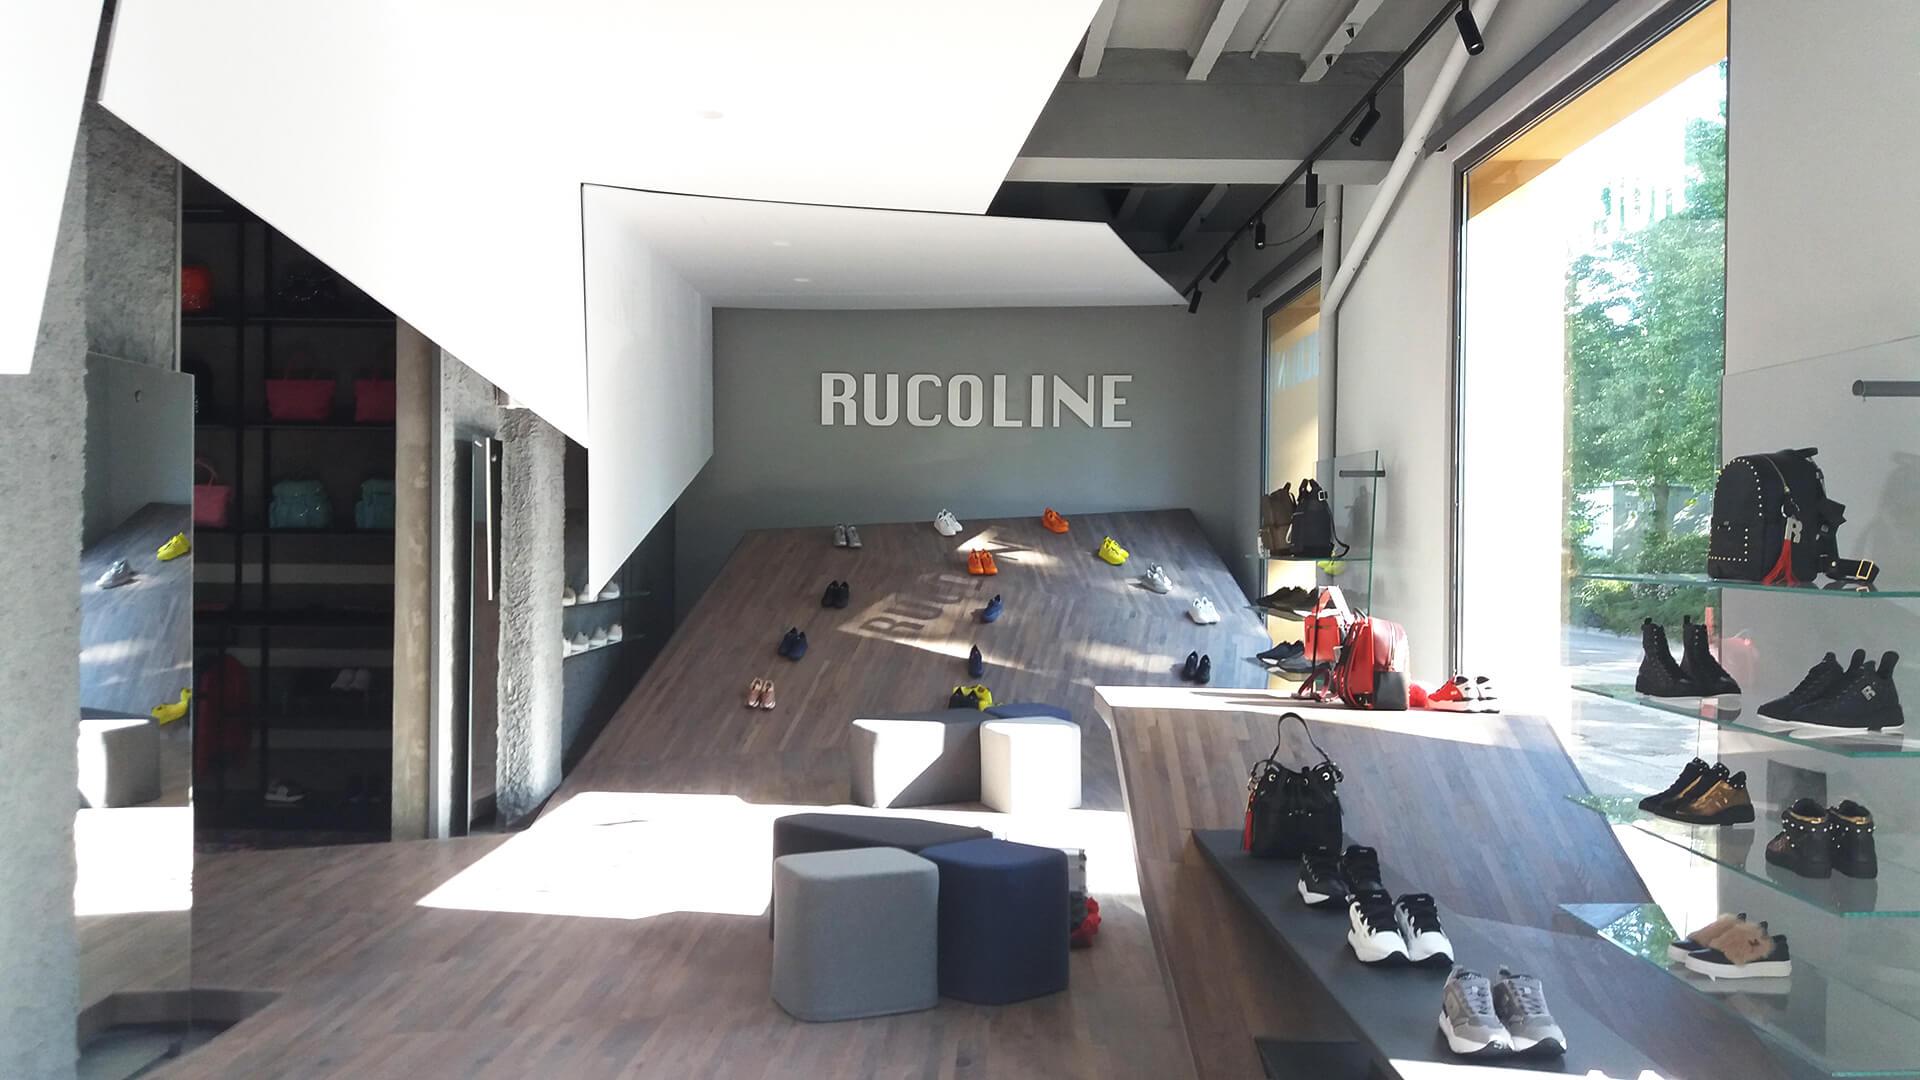 Allestimenti Grafox - Shop & Food - Rucoline Perugia